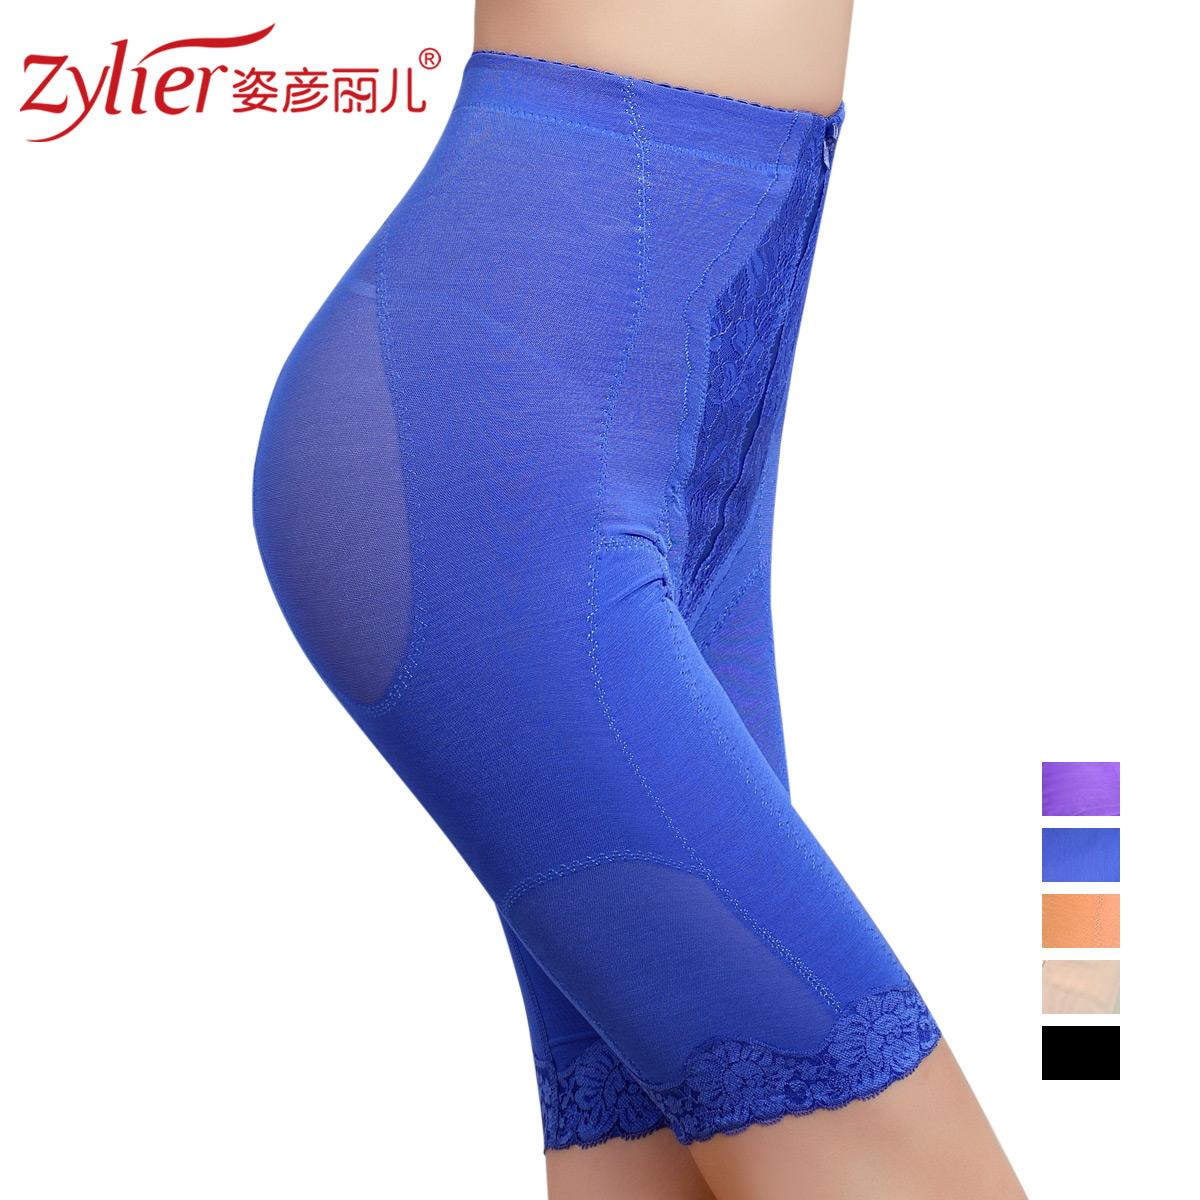 Royal high waist body shaping pants drawing butt-lifting abdomen pants beauty care pants body shaping panties sk18